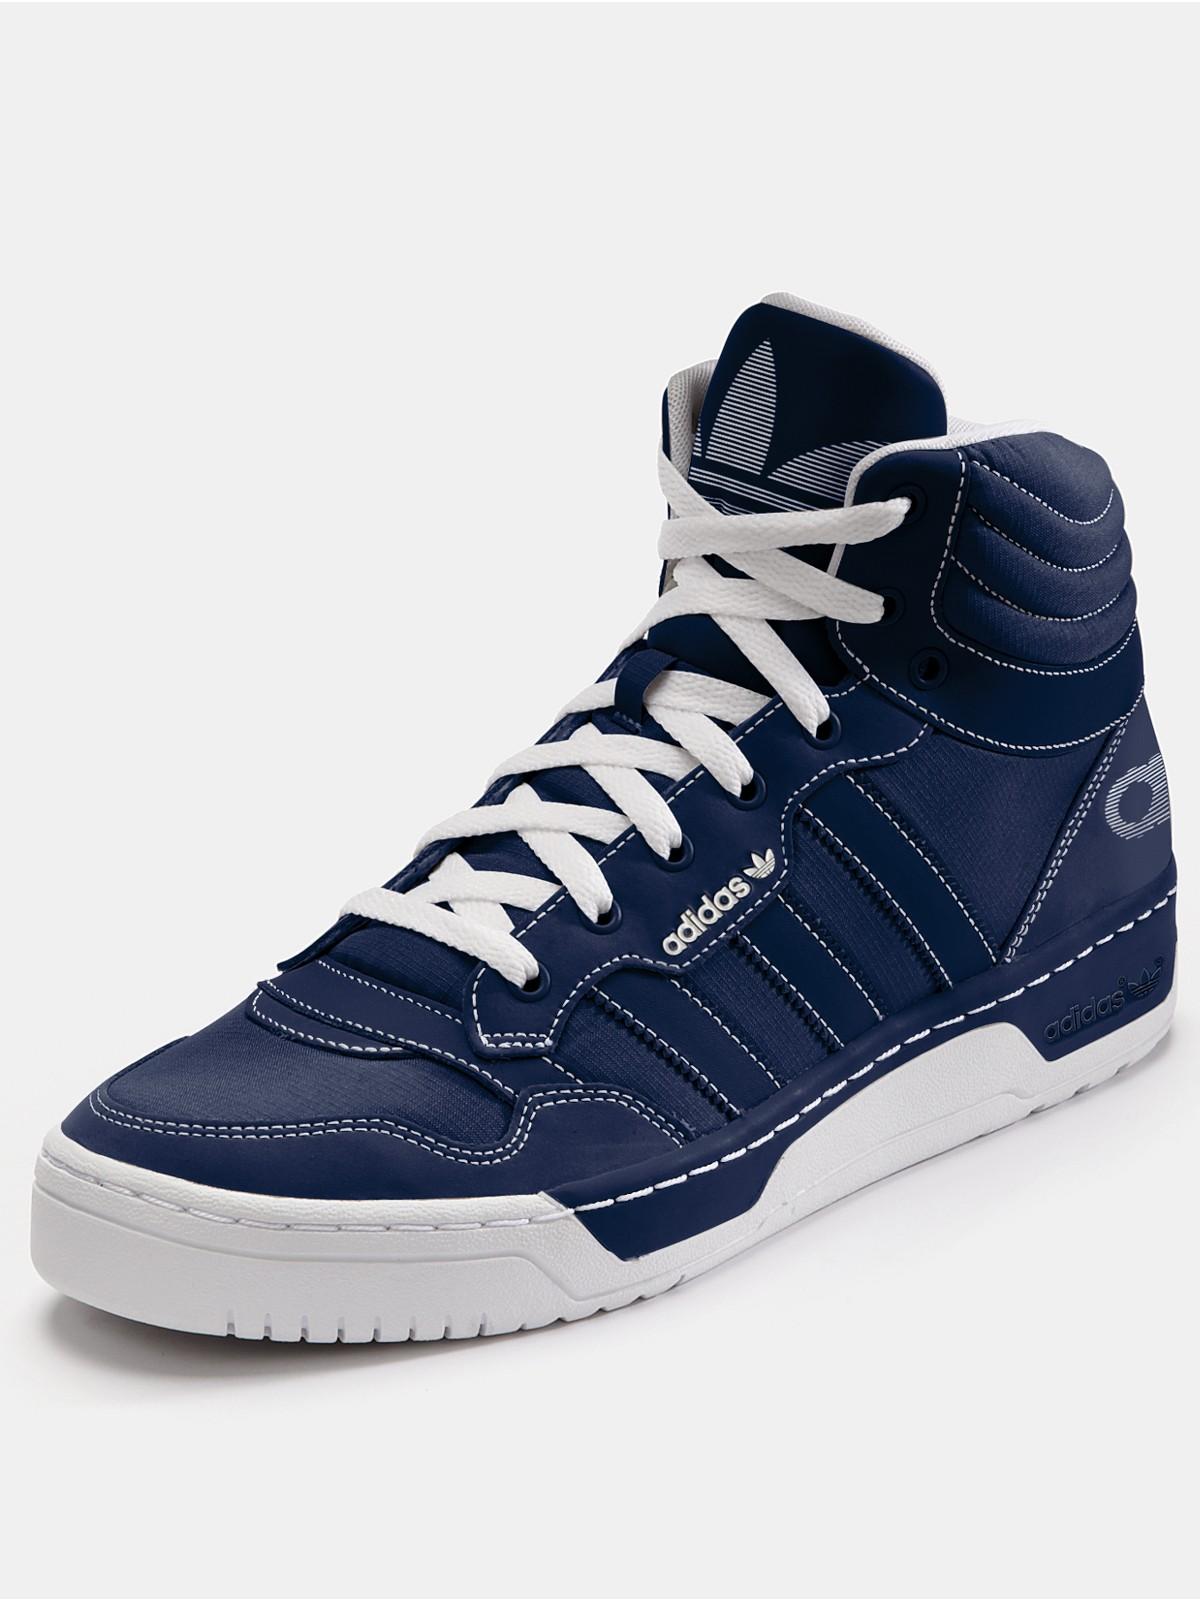 Adidas Top Ten Hi Blue Leather Sneakers In Blue For Men: Adidas Adidas Originals Irvington Mens Hi Top Trainers In